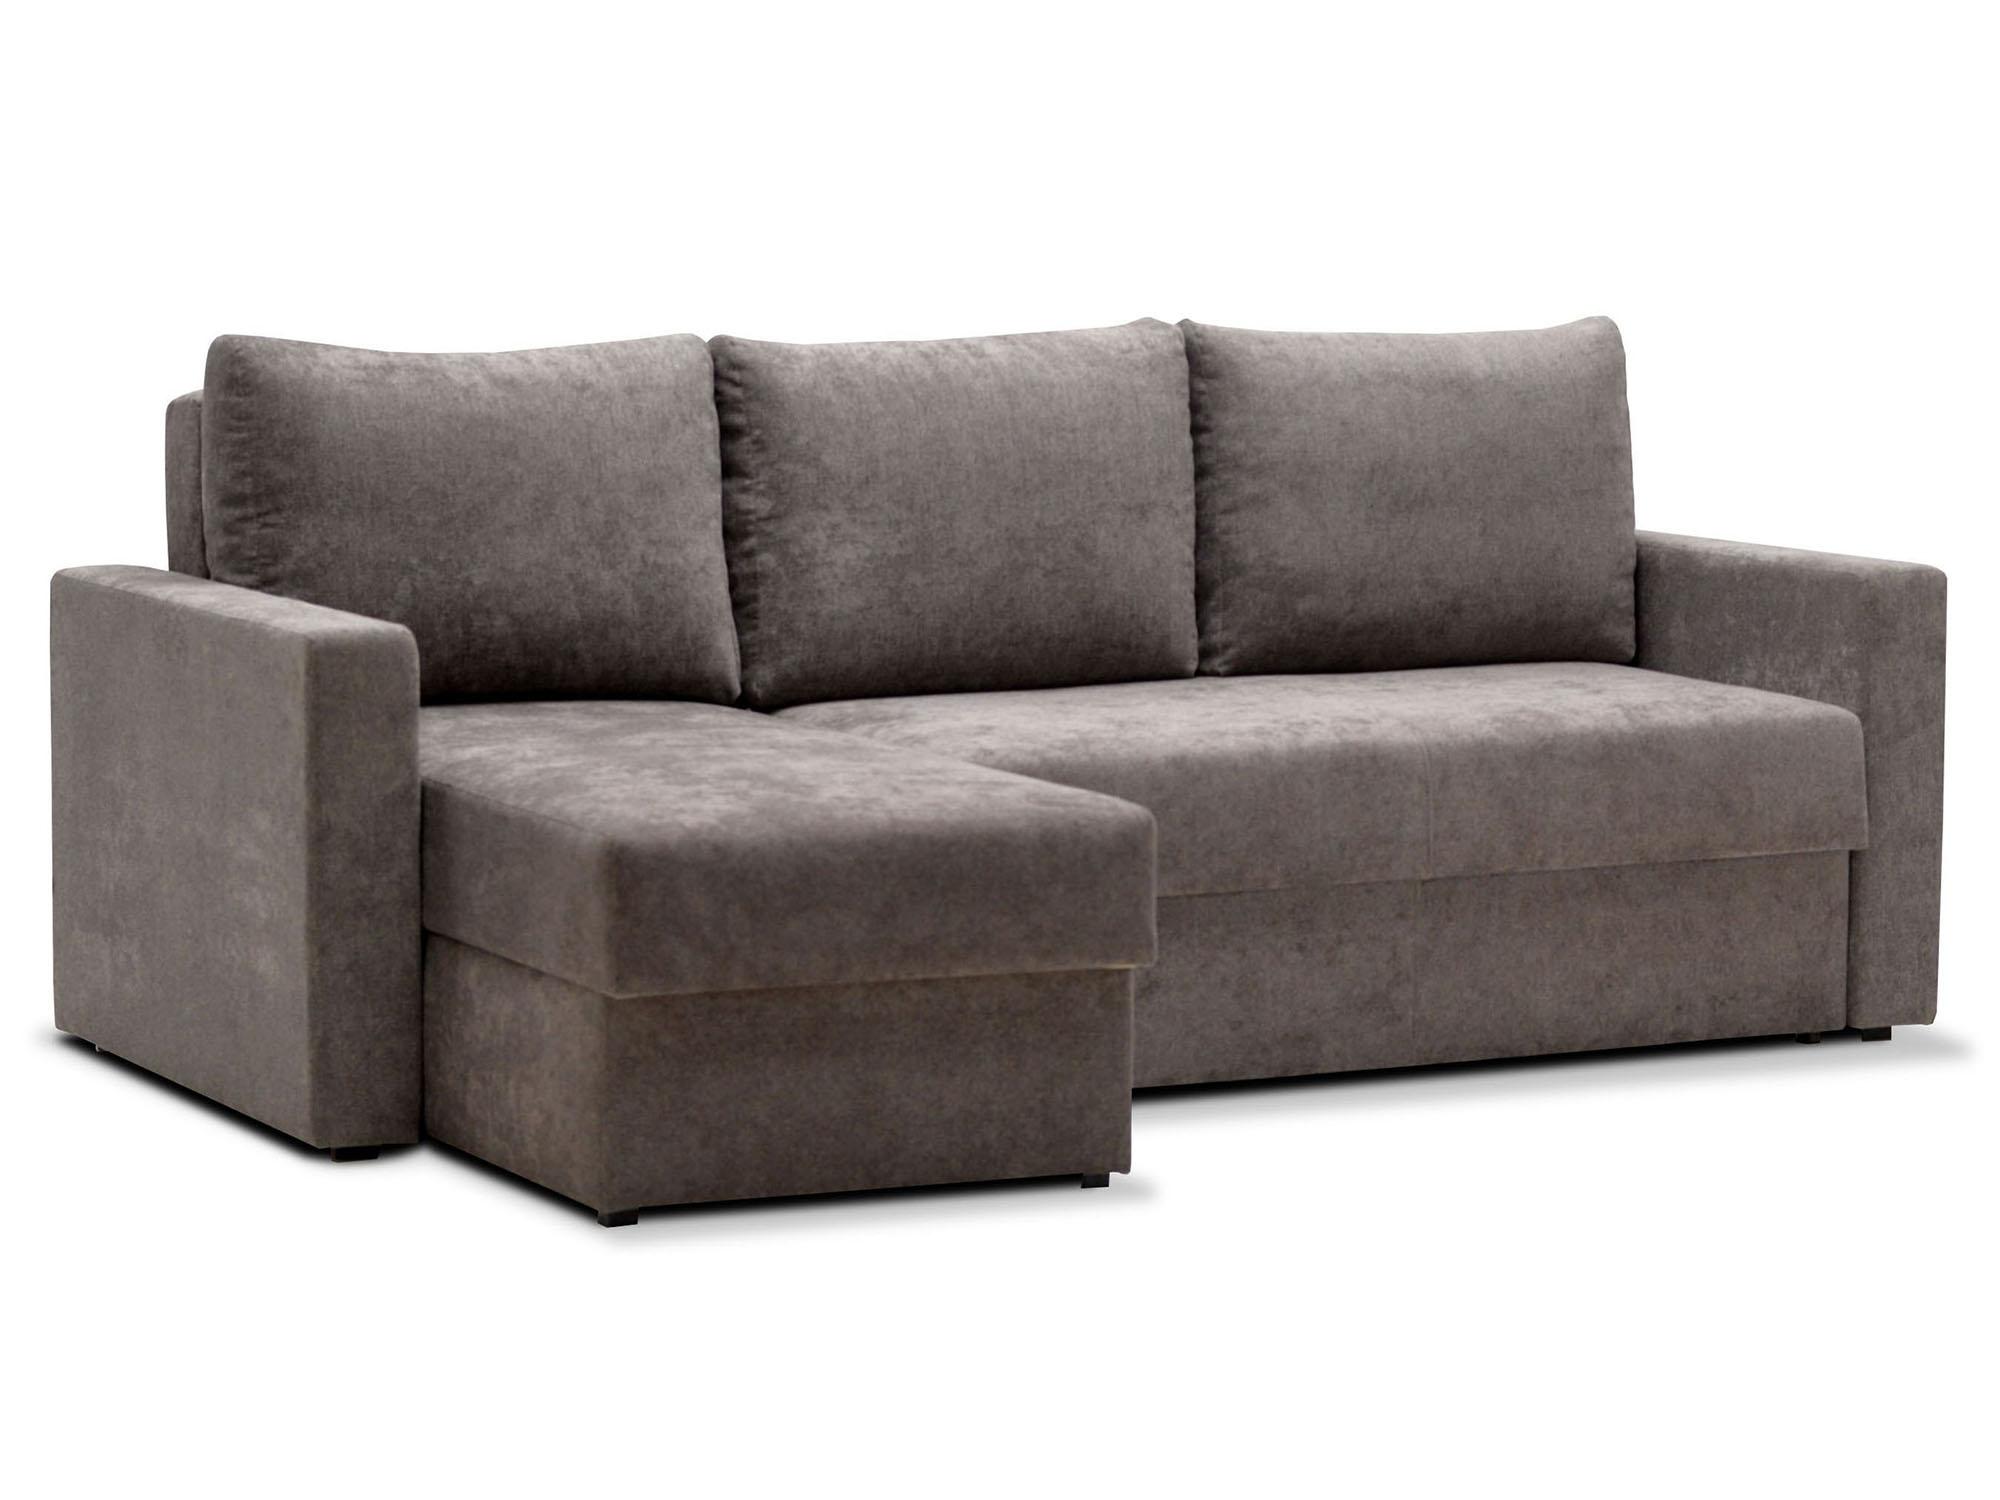 Угловой диван Мекс 4 MebelVia Серый